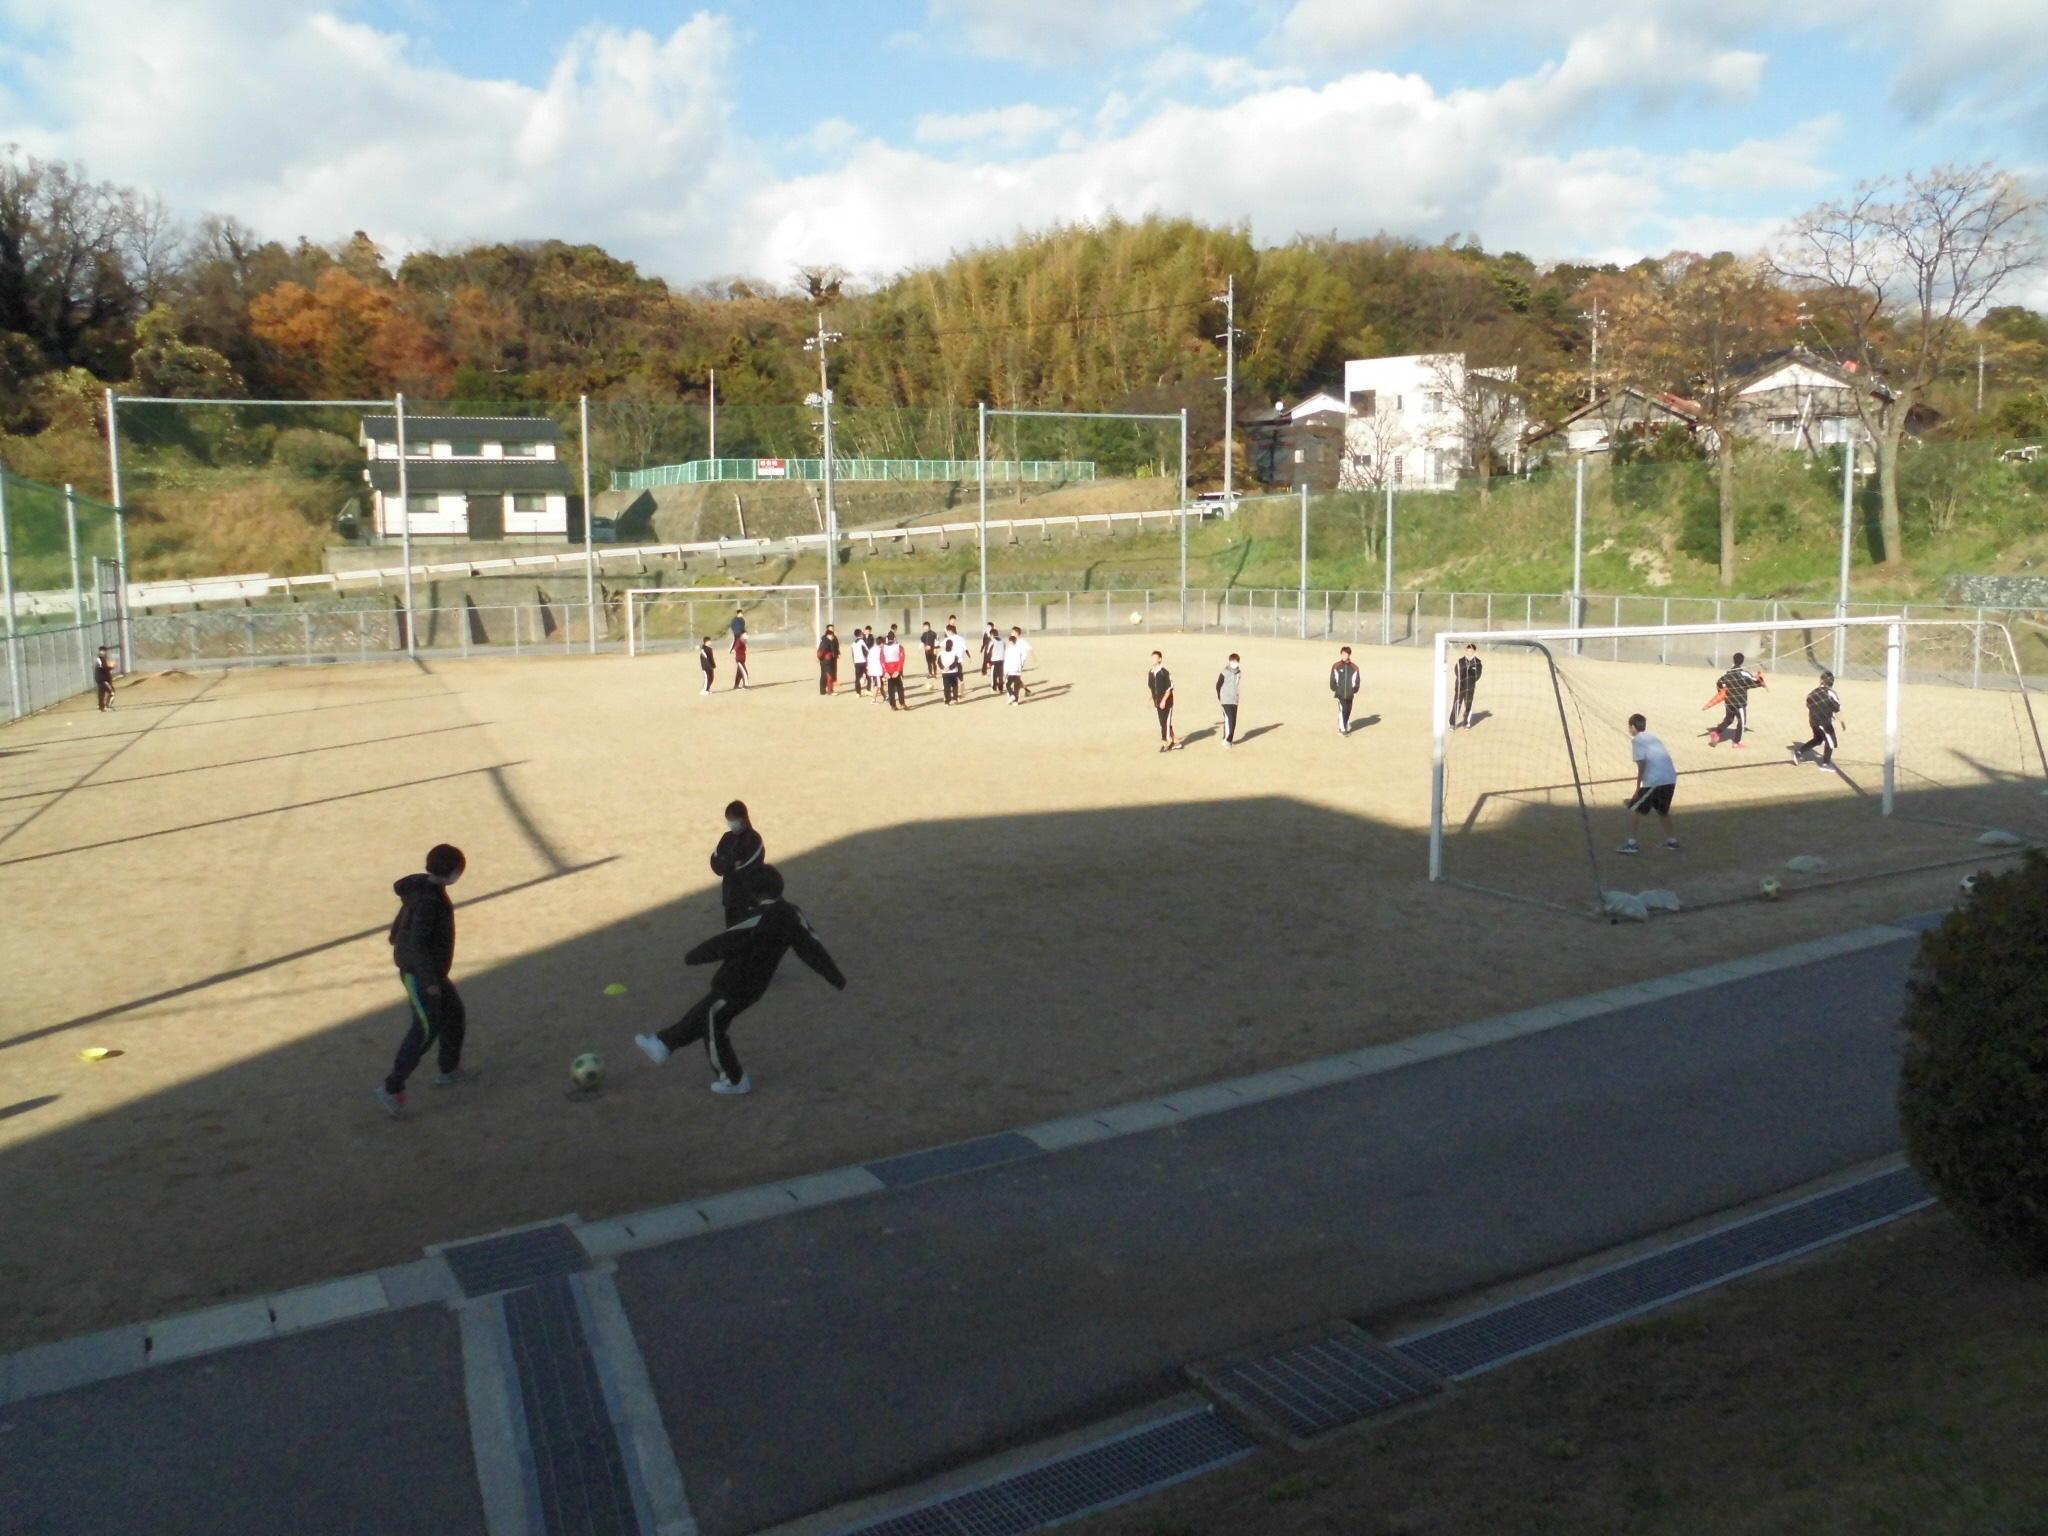 http://www.shimanet.ed.jp/hamadayougo/news/CIMG7700.JPG